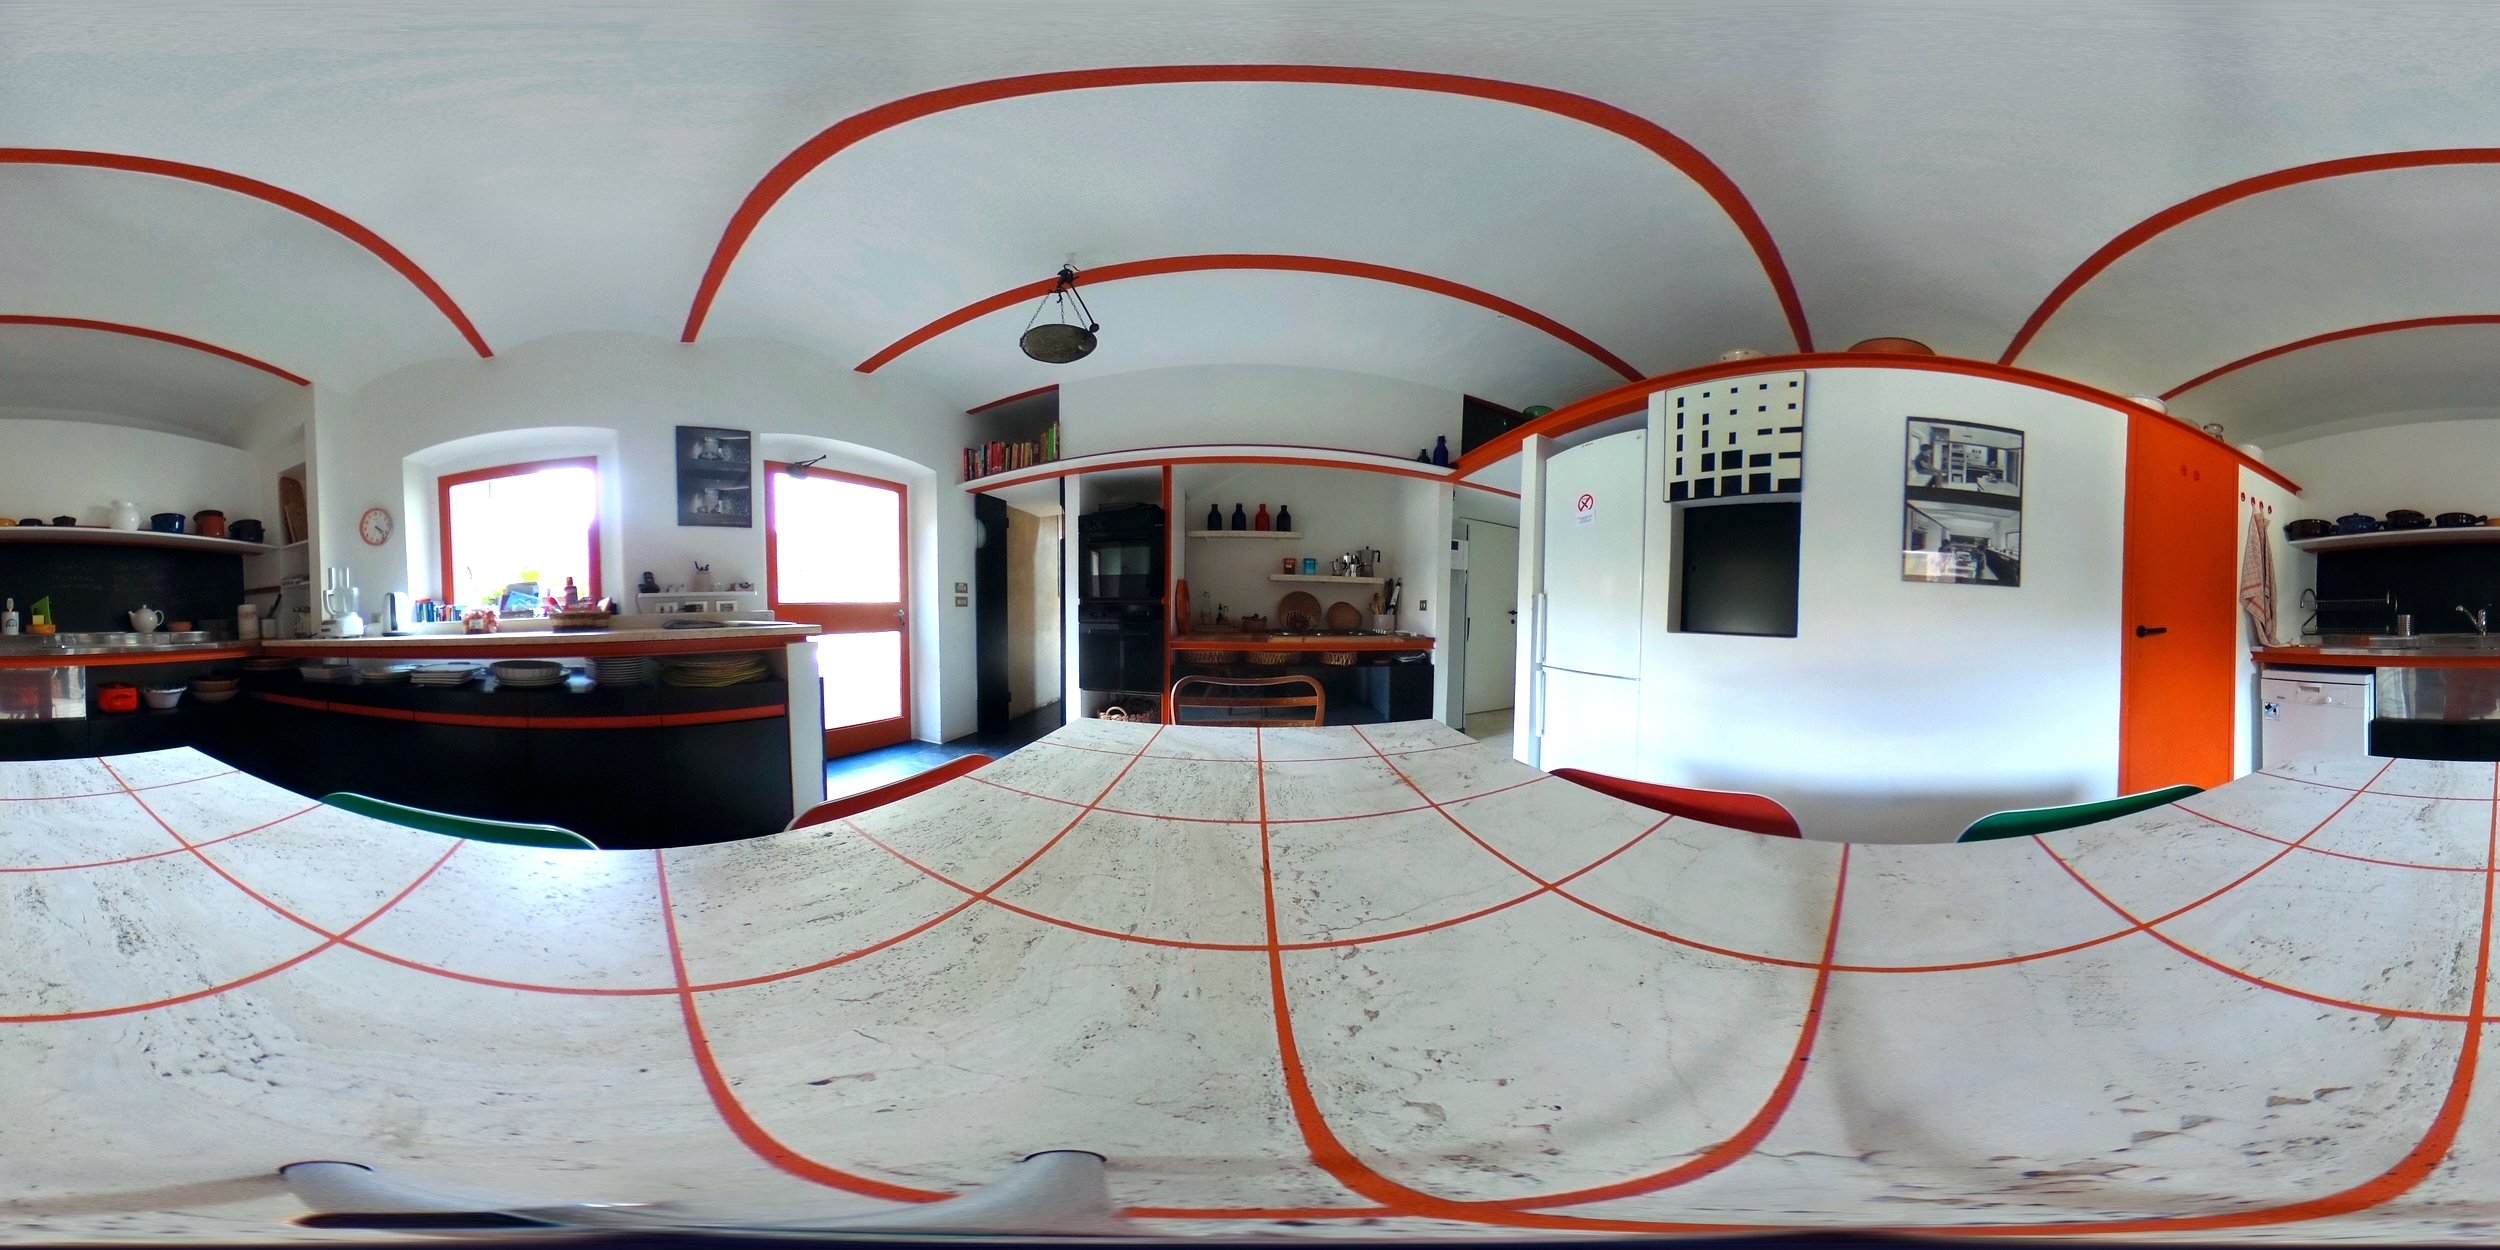 Kitchen in 360 by Tom Sacchi